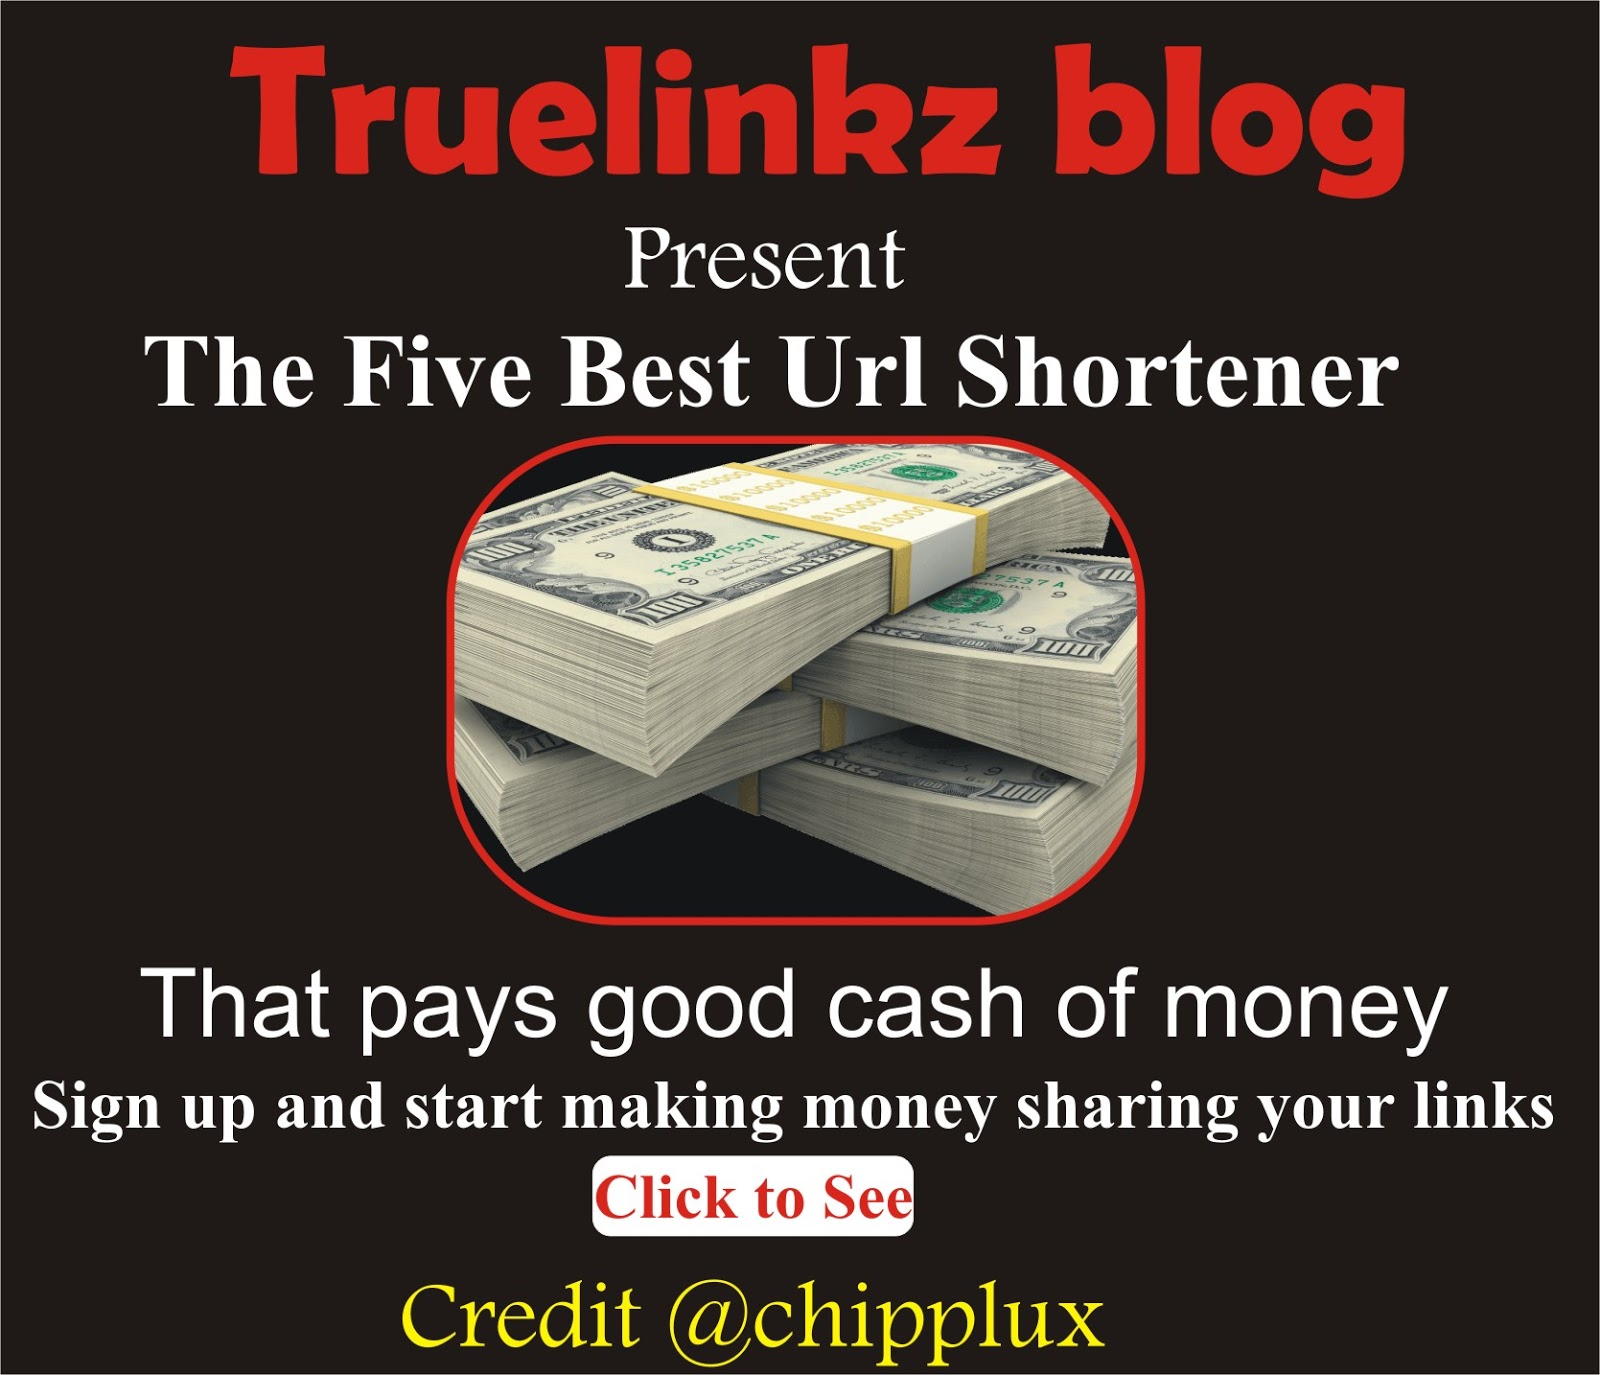 The five best url shortener to make money with in 2019